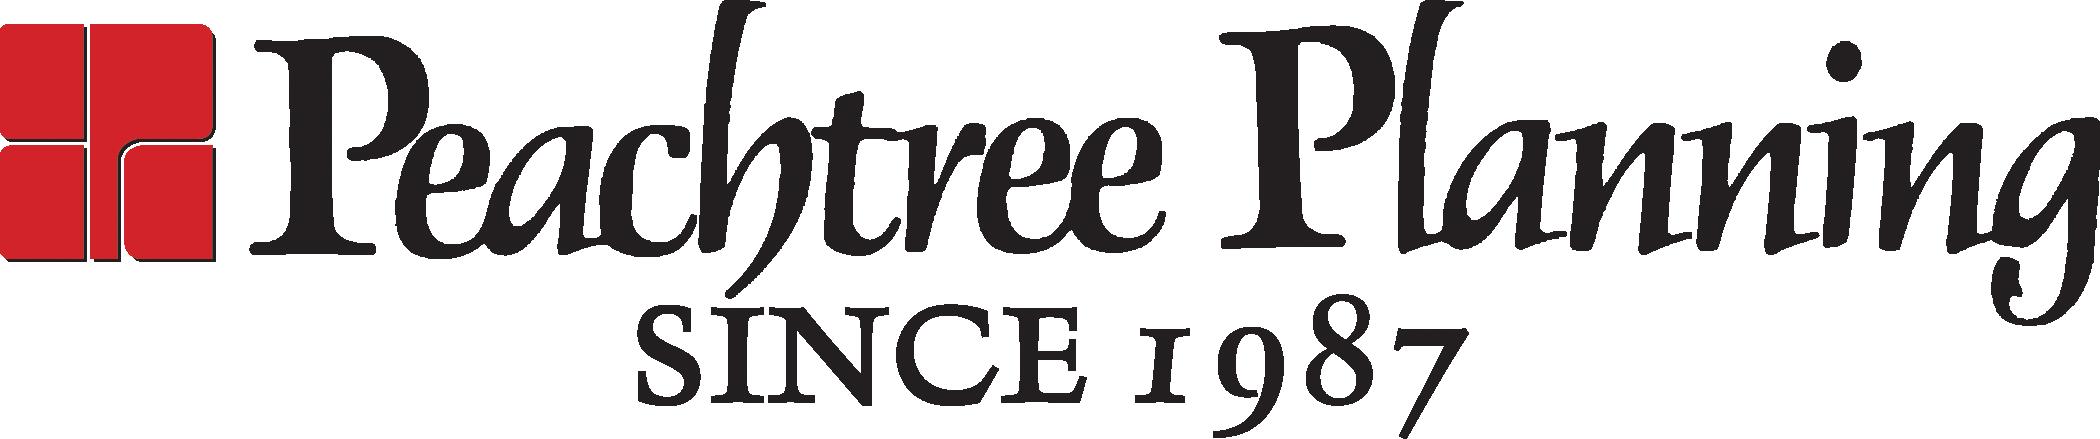 Peachtree Planning Company Logo